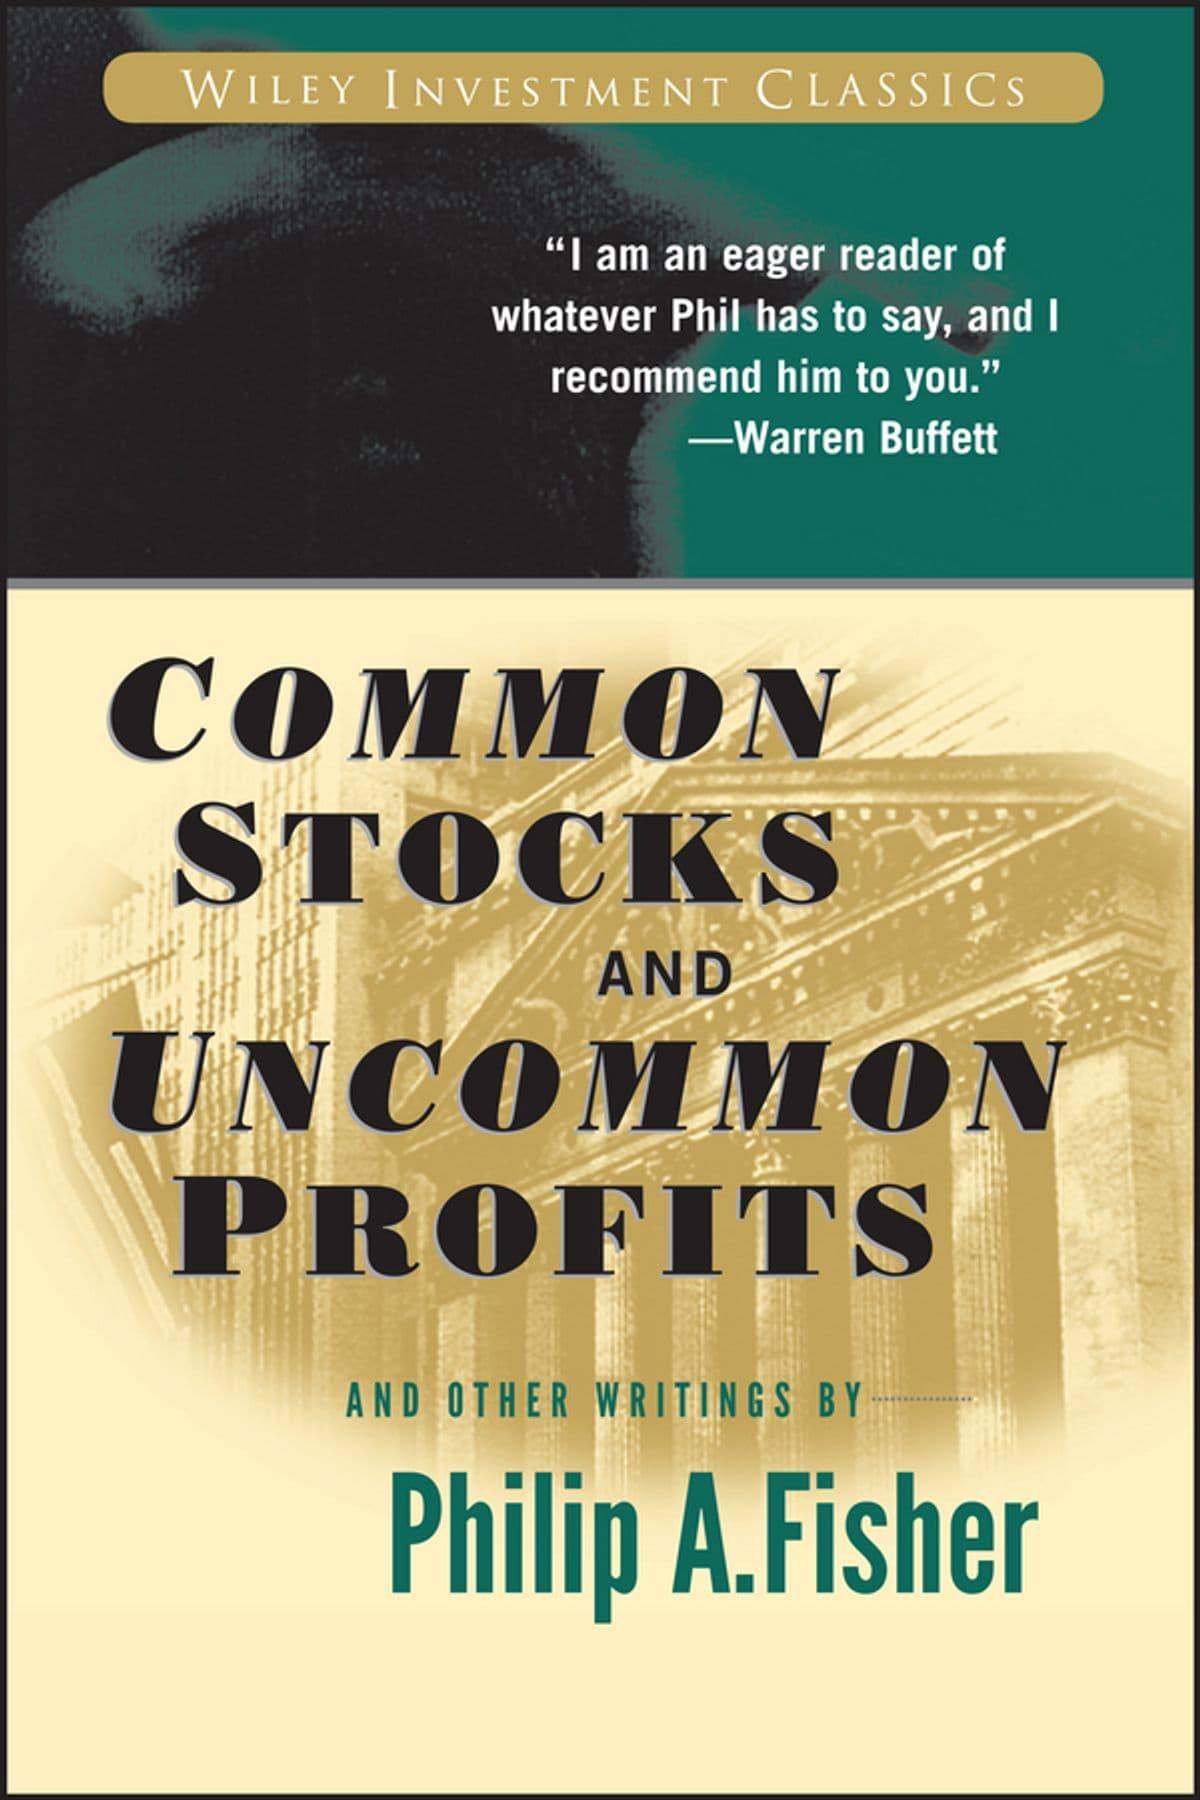 Philip Fisher - Common Stocks and Uncommon Profits